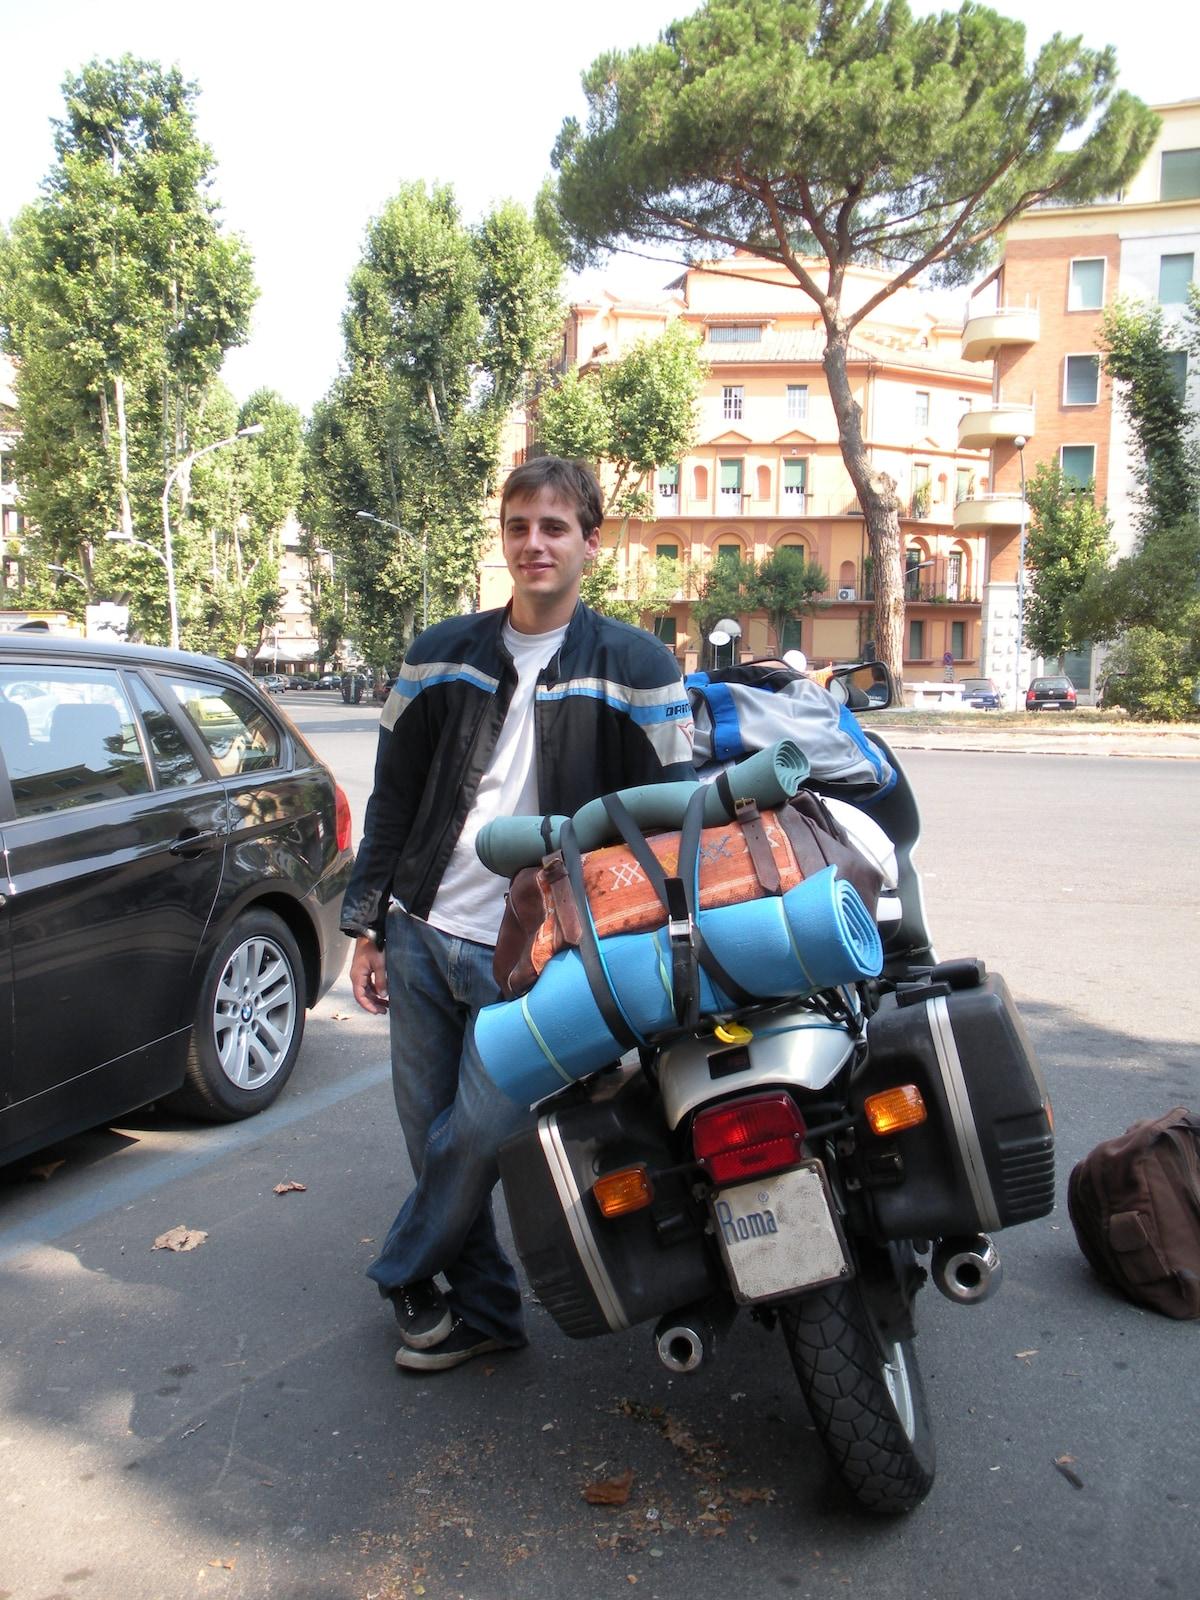 Giacomo from Monteleone Sabino